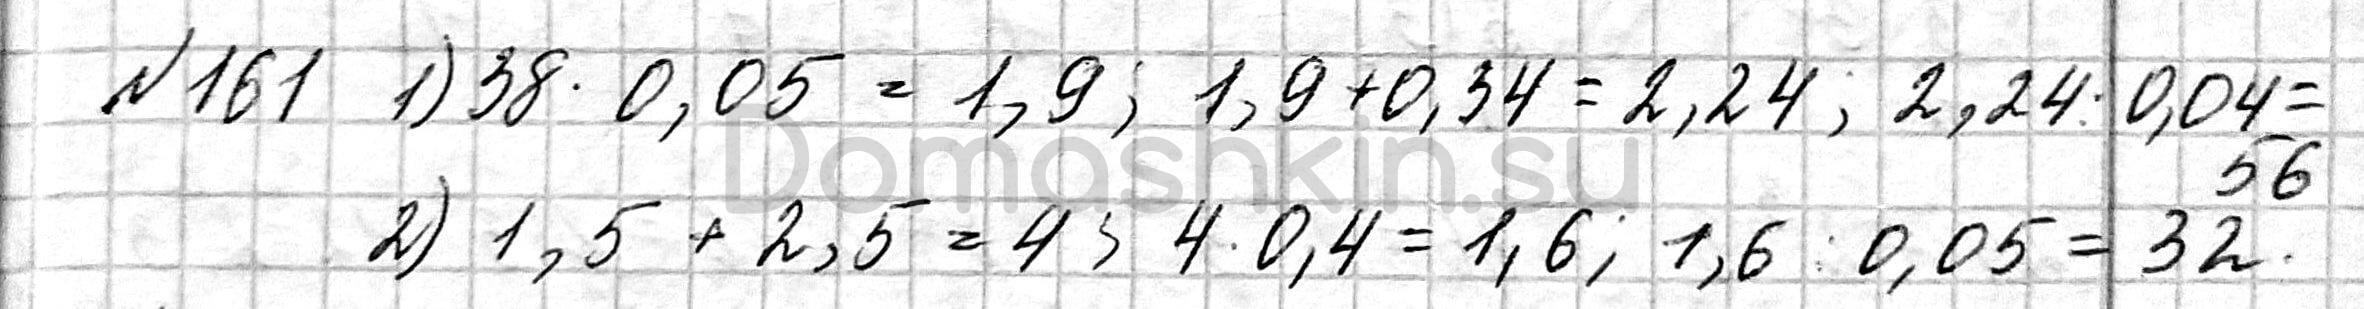 Математика 6 класс учебник Мерзляк номер 161 решение